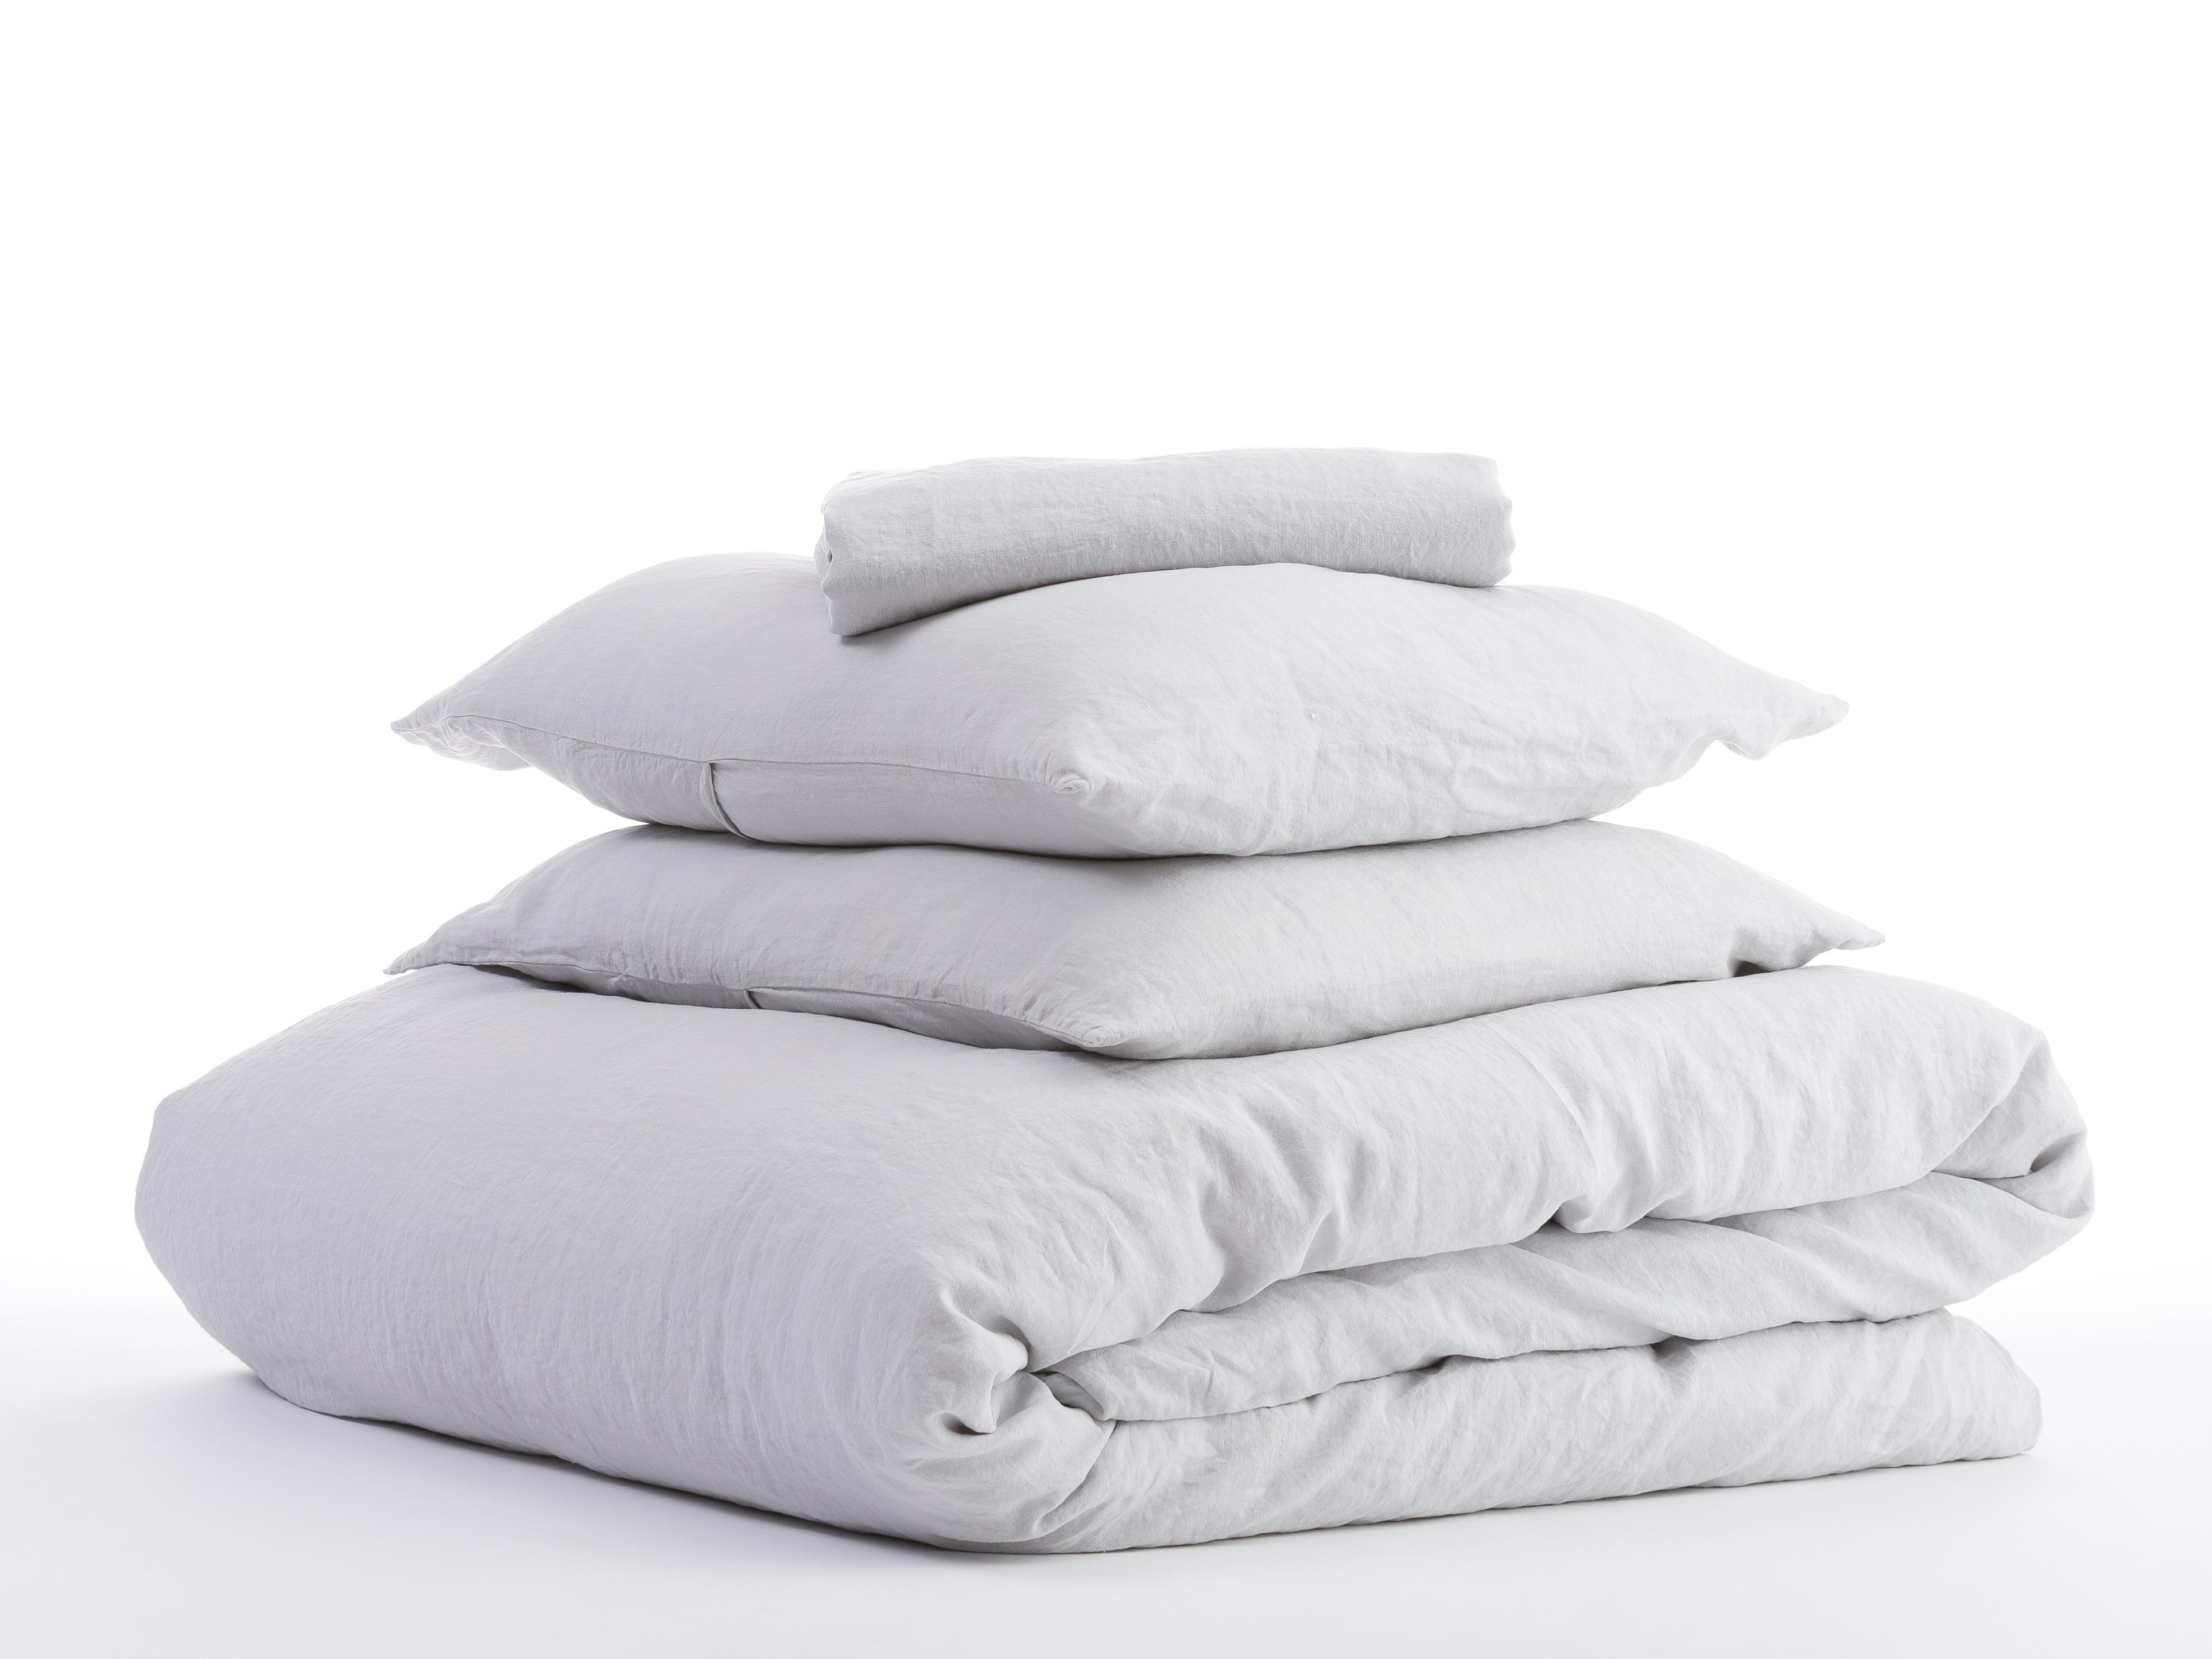 White Linen Bedding Spary